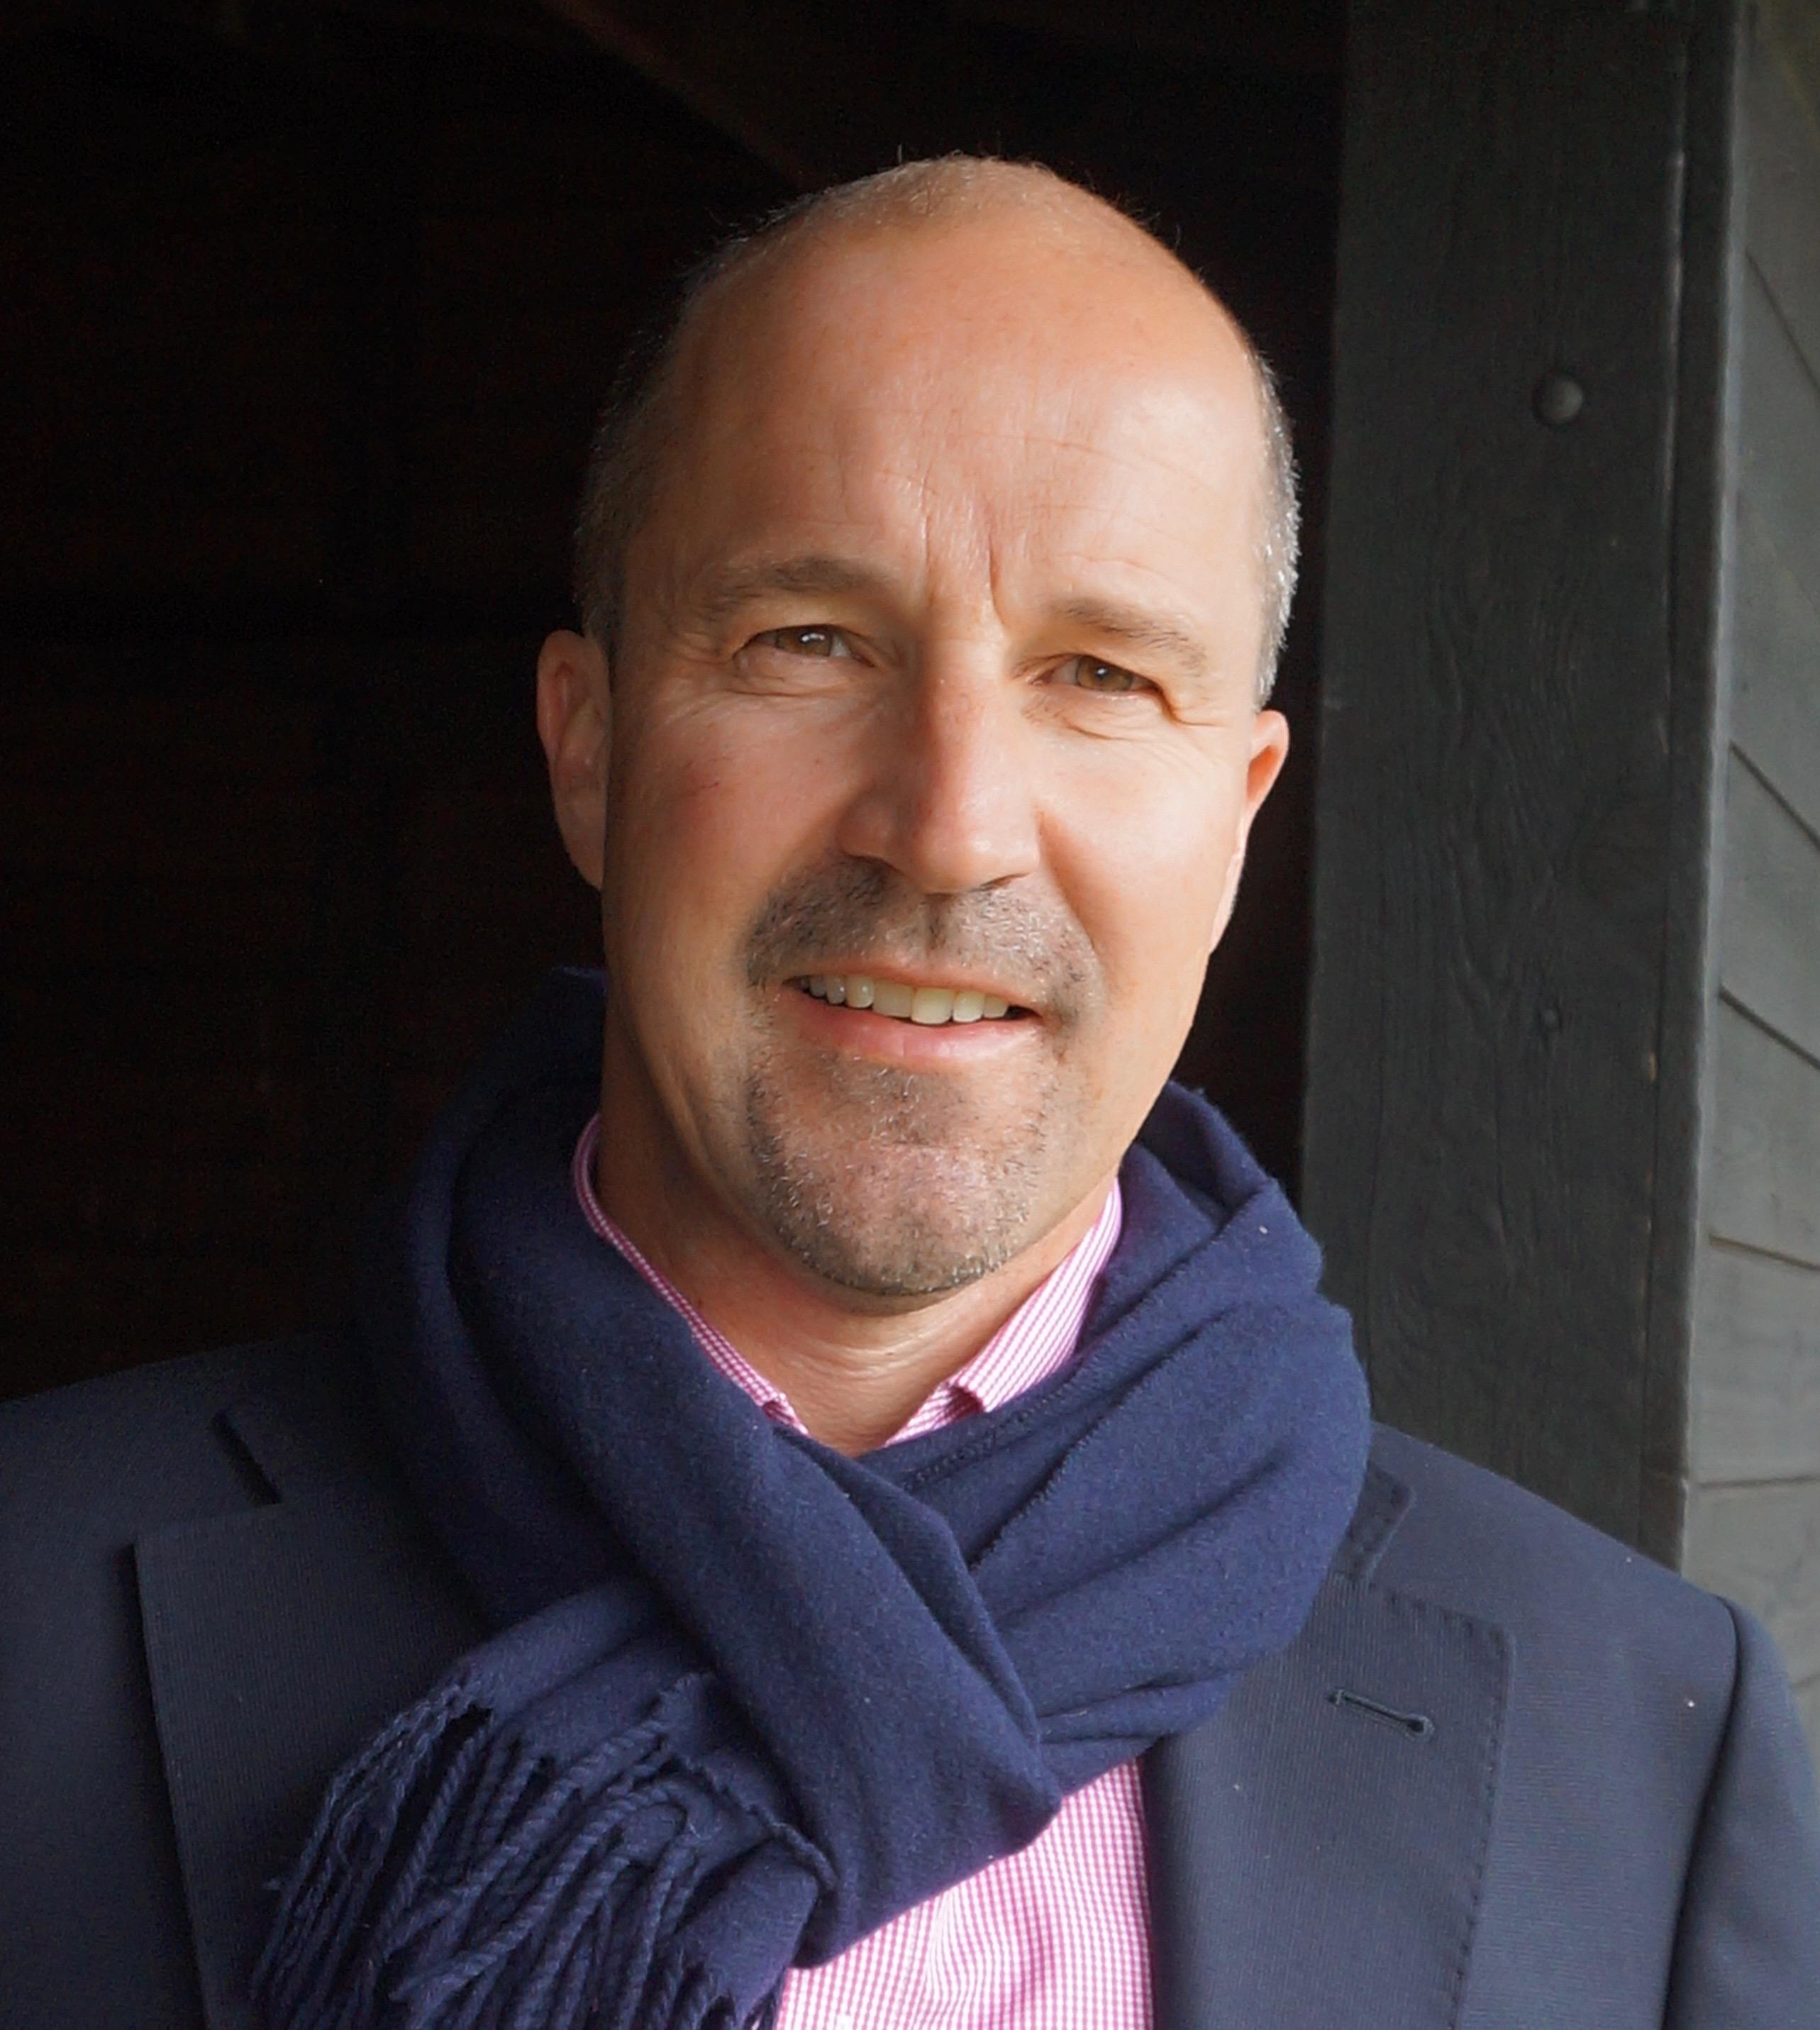 About the Author – Gordon McAlpine